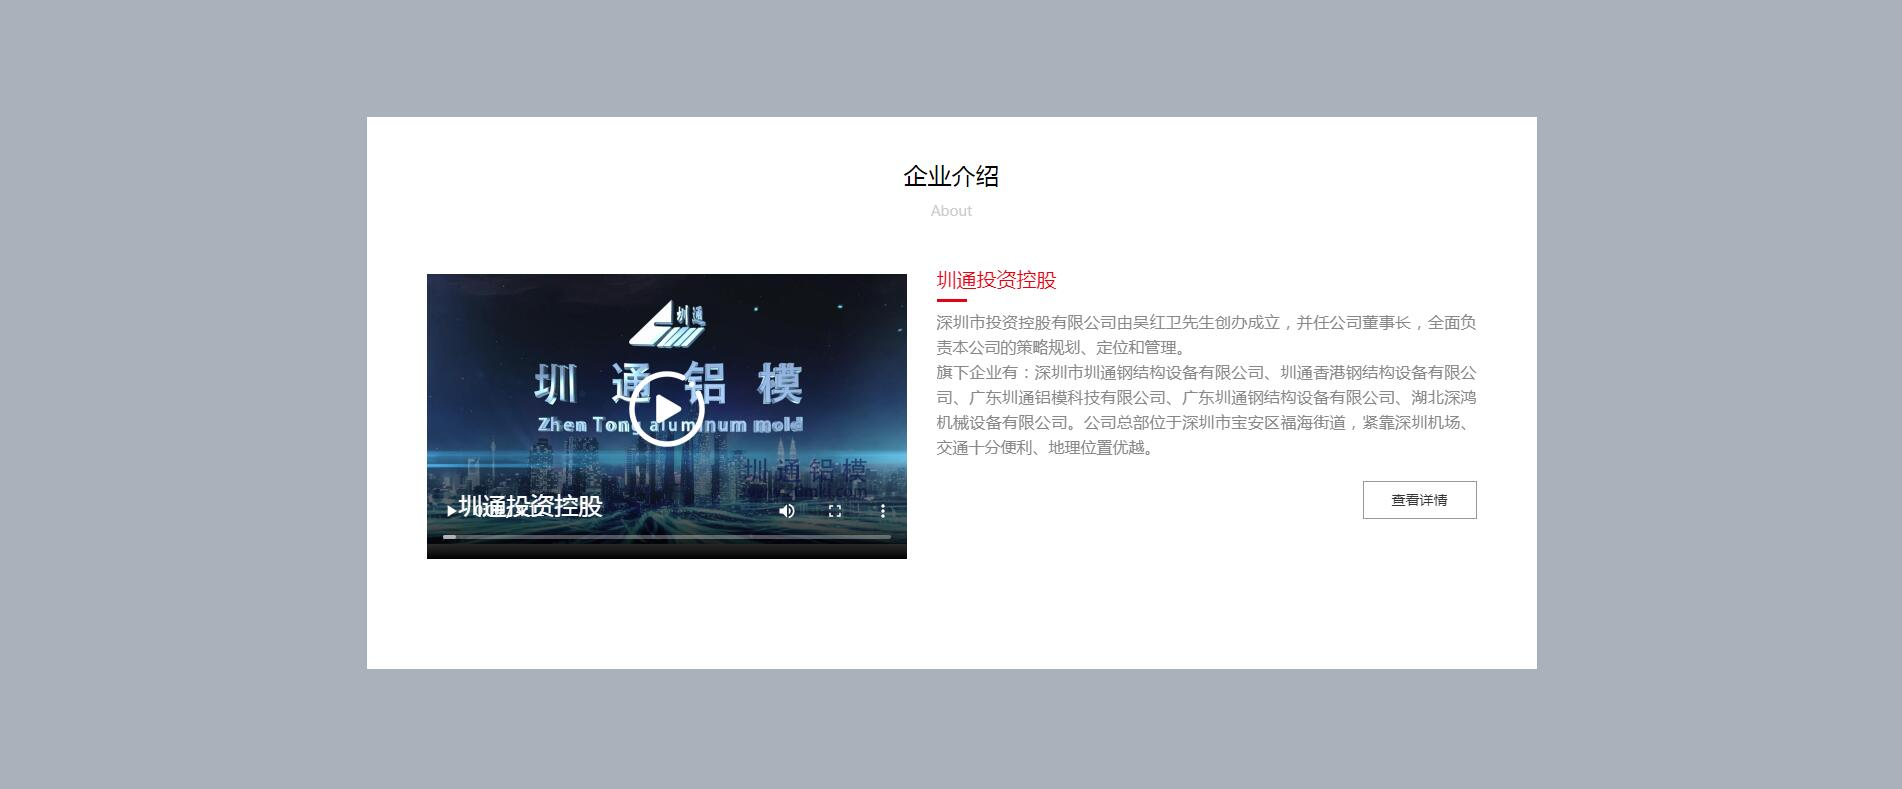 iBlackGroup建筑集团企业网站定制